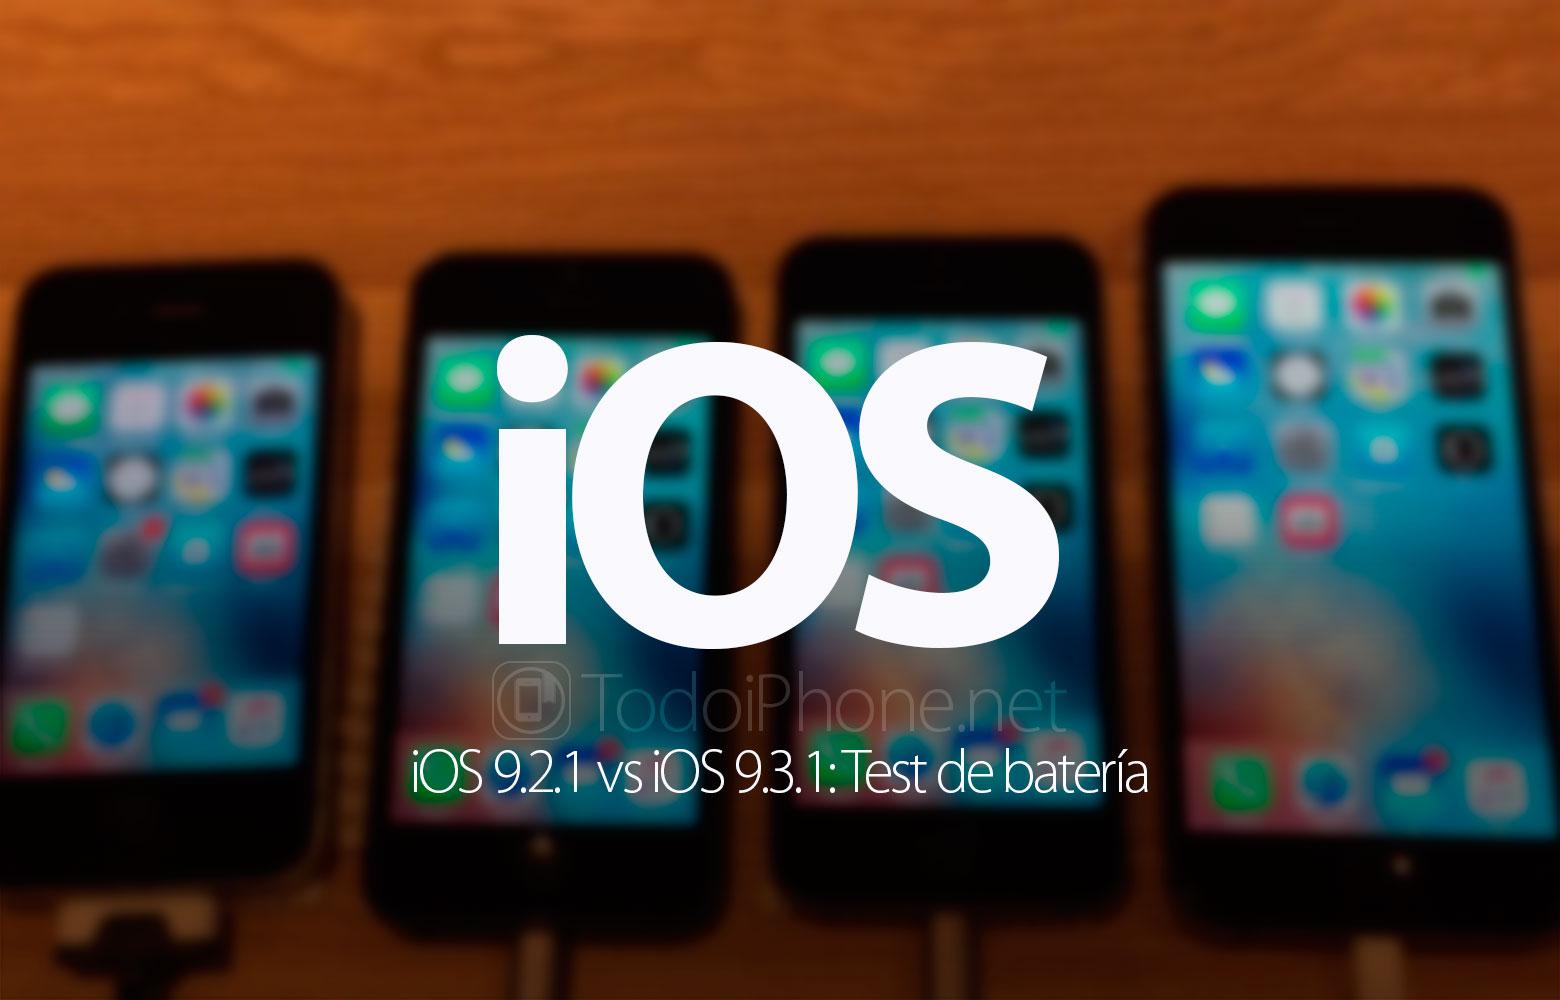 ios-9-2-1-vs-ios-9-3-1-test-bateria